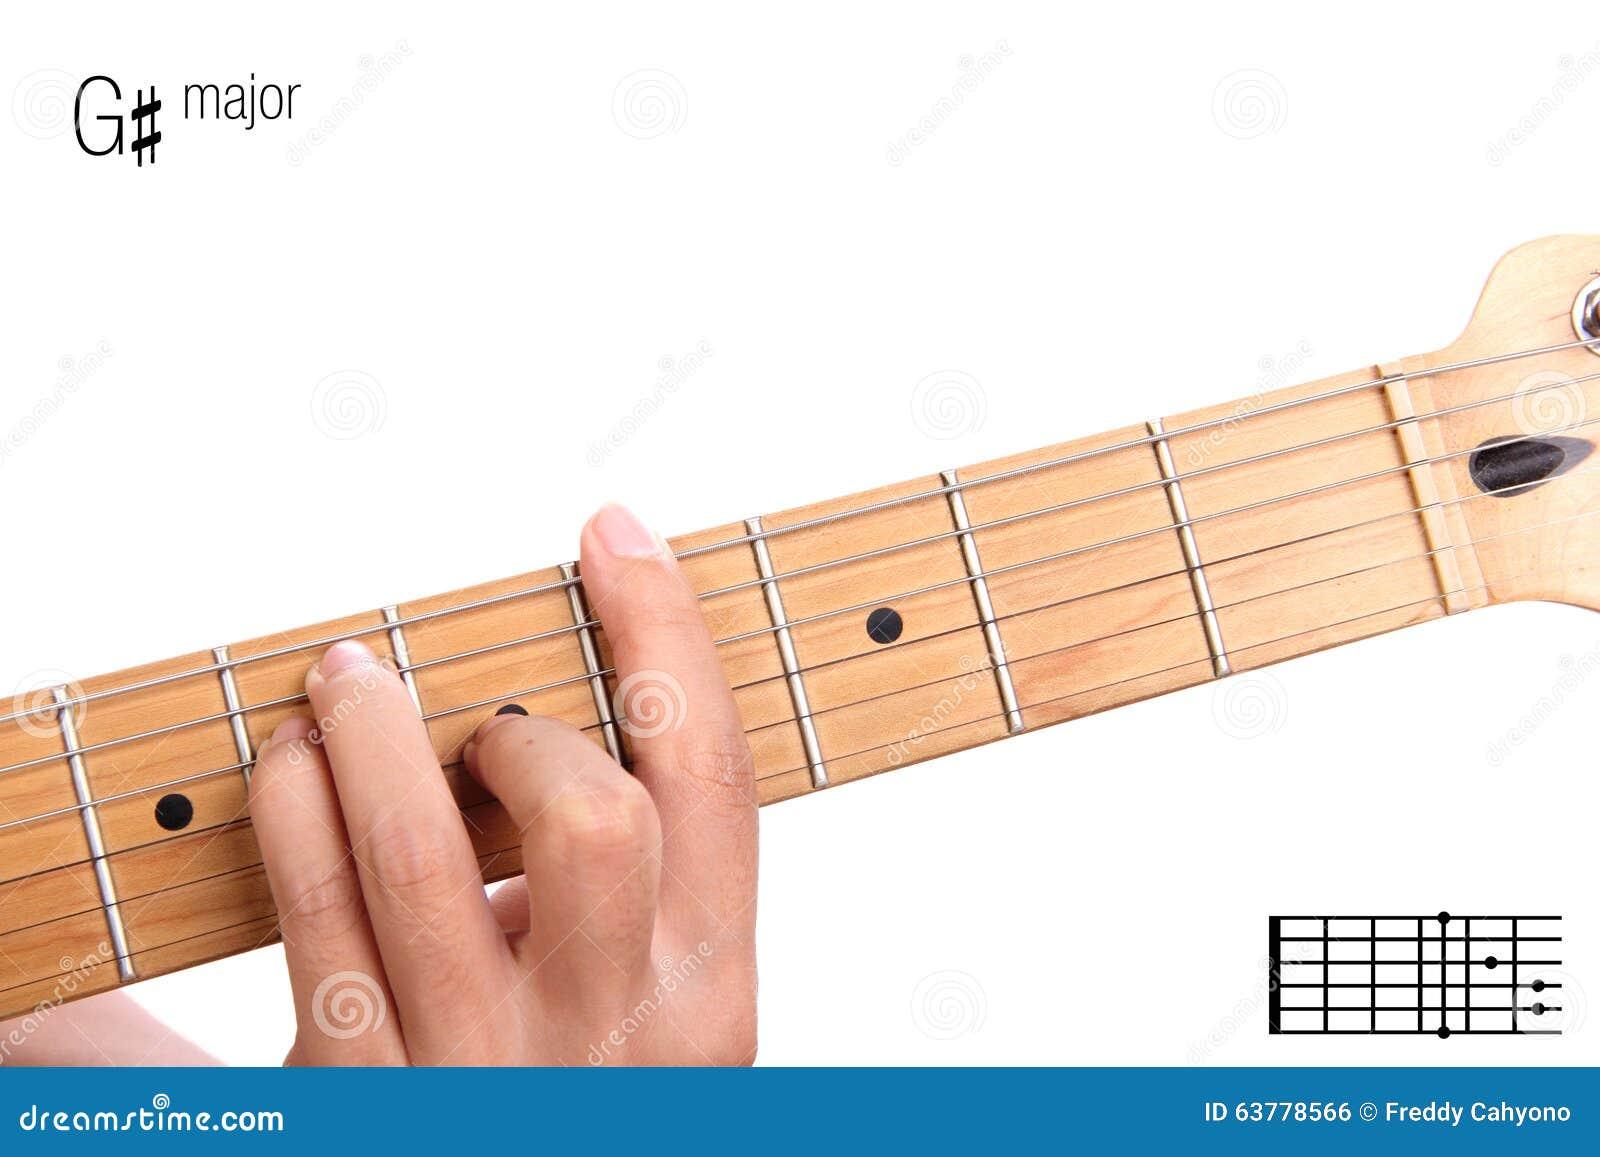 Welcome to GSharp Guitars